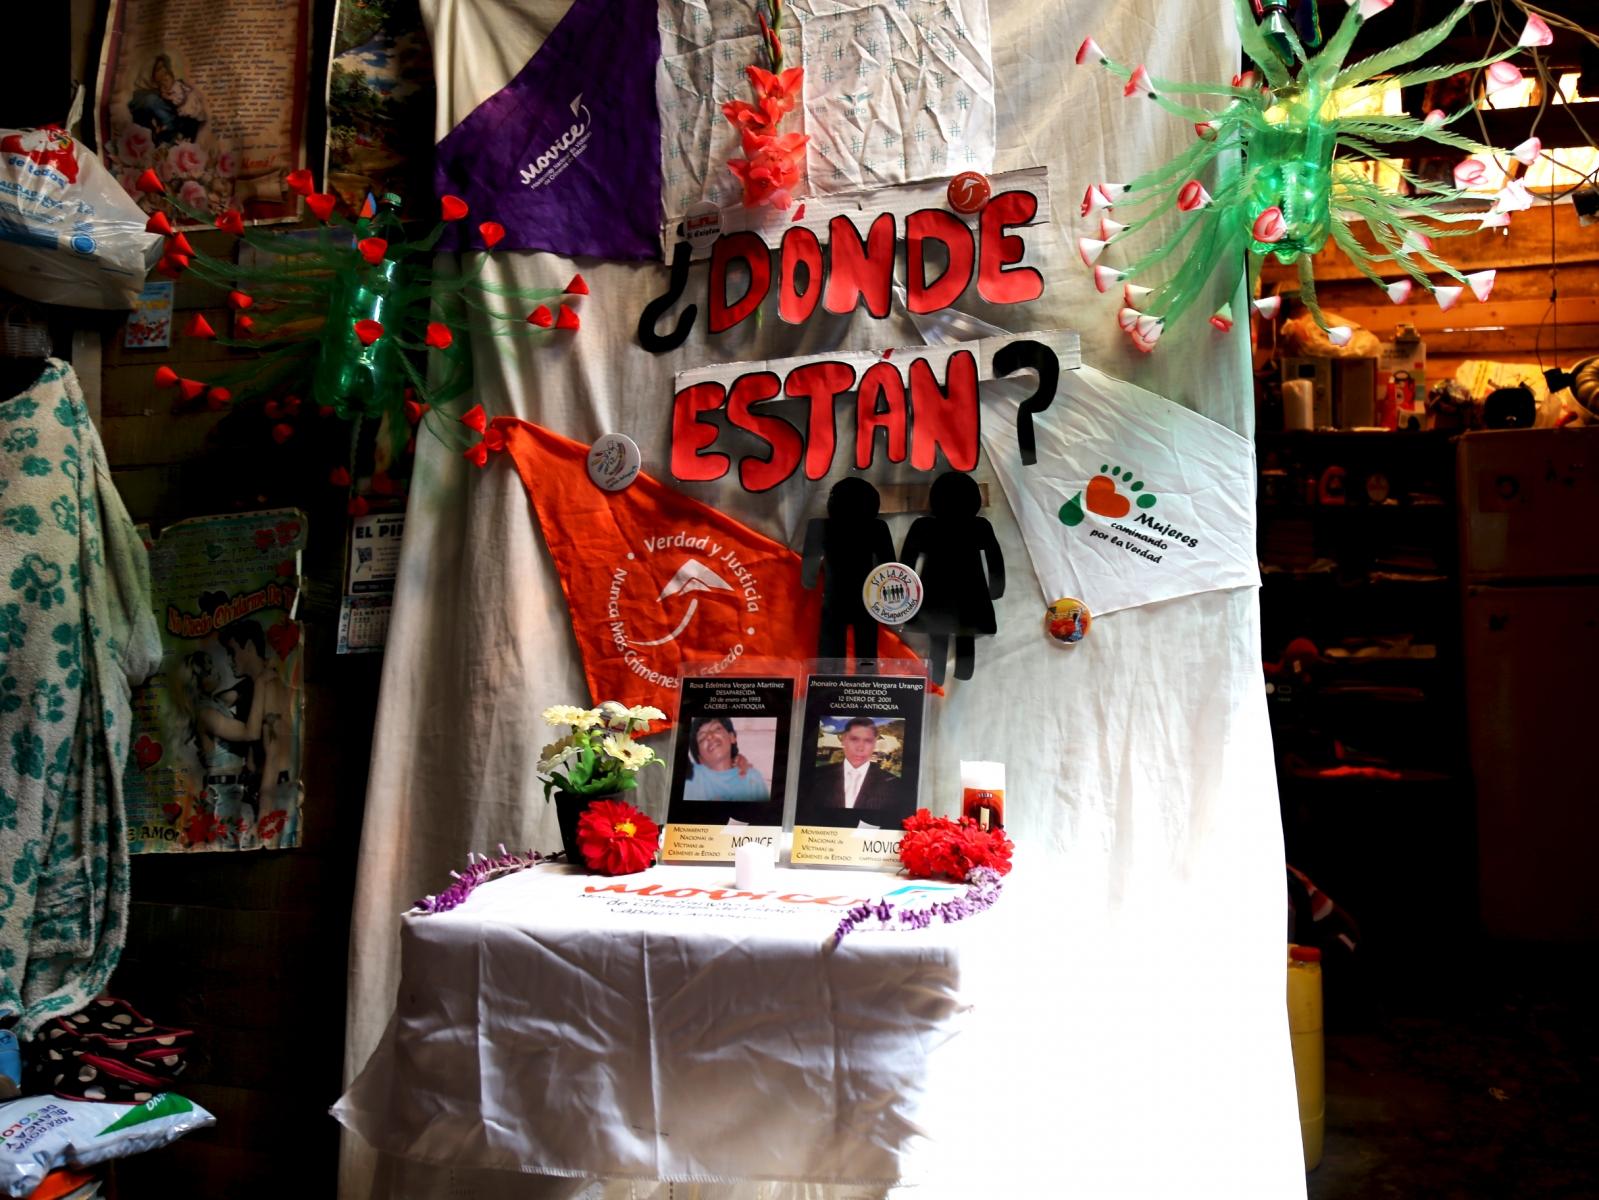 Rosa Edelmira Vergara Martínez: Desaparecida el 30 de Enero de 1993 en Cáceres - Antioquia.  Jhonairo Alexander Vergara Urango: Desaparecido el 12 de enero de 2001 en Caucasia – Antioquia